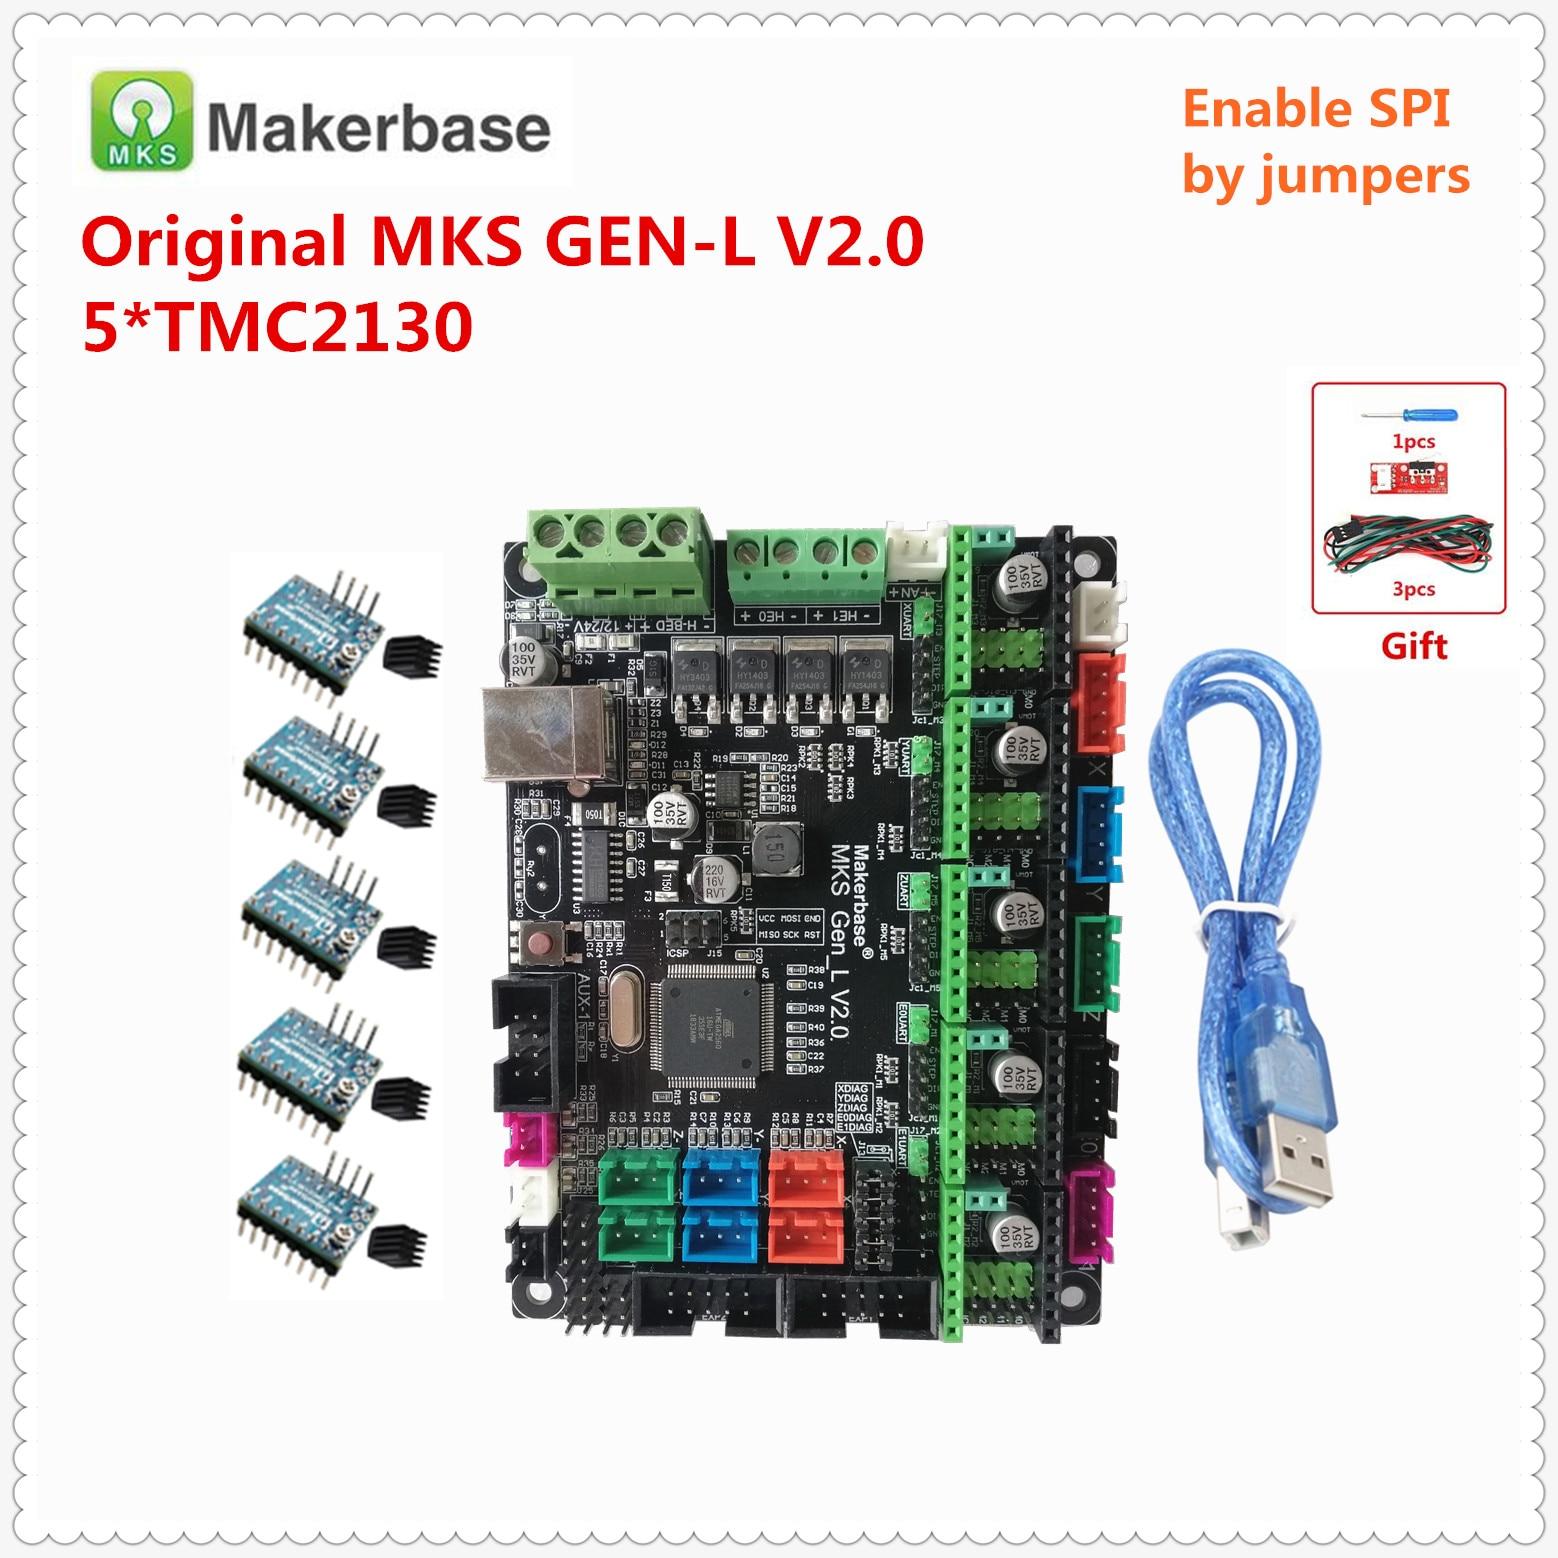 Makerbase original MKS GEN L V2.0 3D printer spare card control mainboard support a4988 DRV8825 tmc2130 tmc2208 tmc2209 lv8729|3D Printer Parts & Accessories| |  - title=